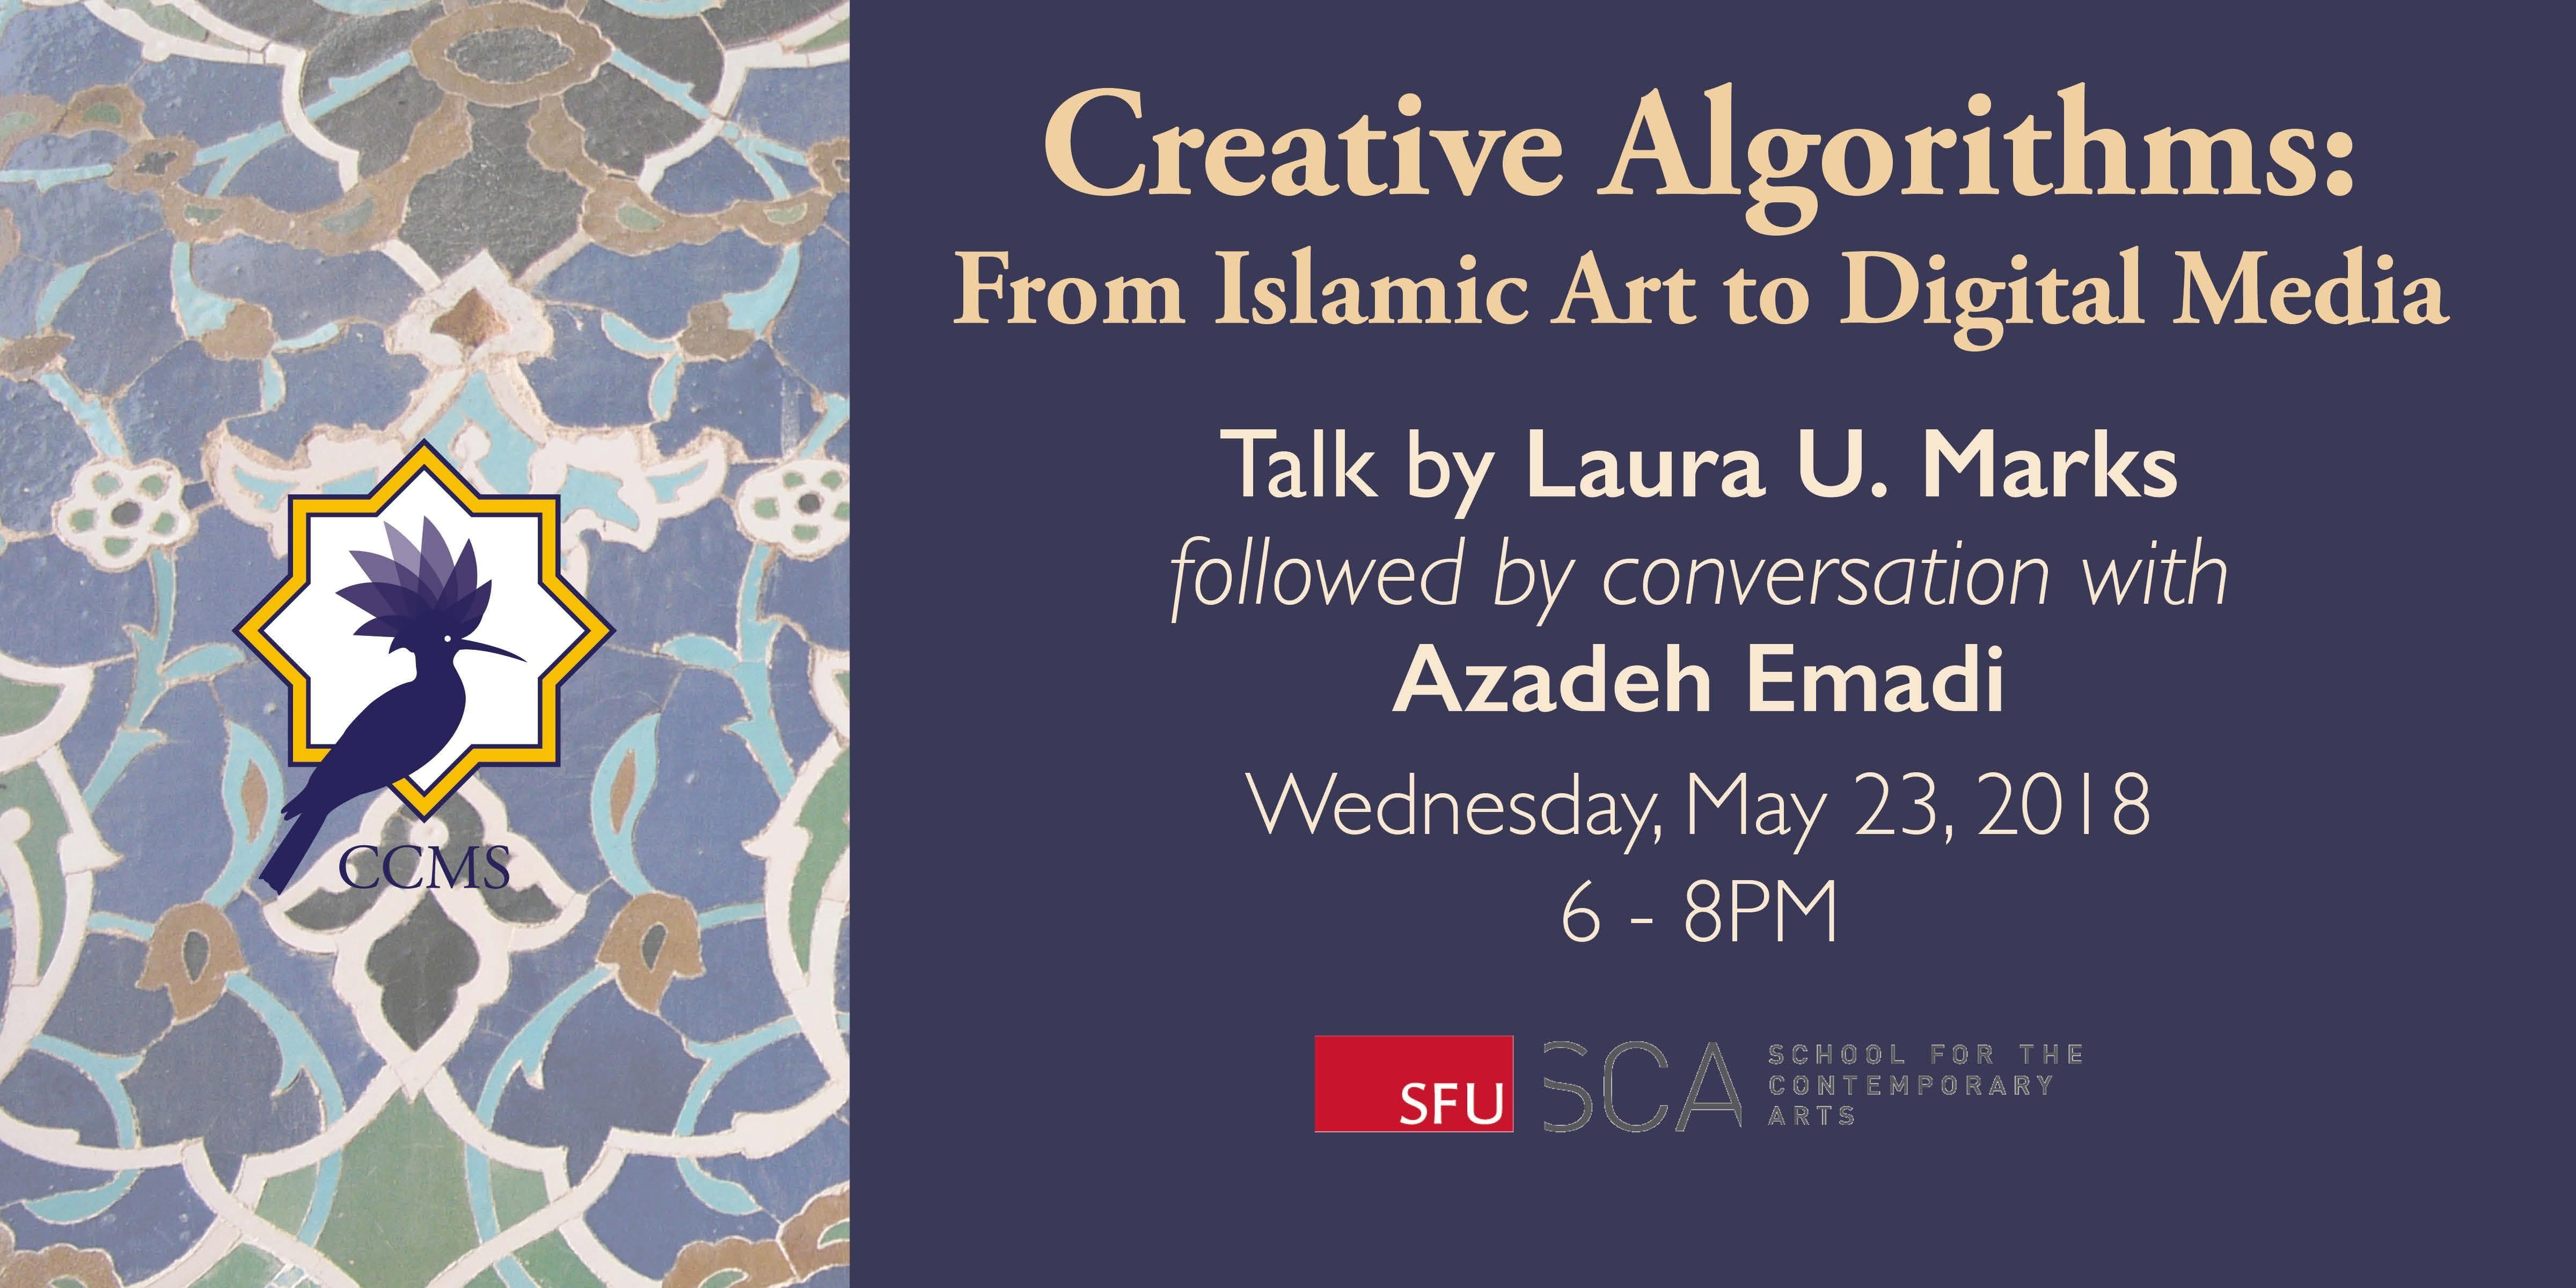 Creative Algorithms: From Islamic Art to Digi